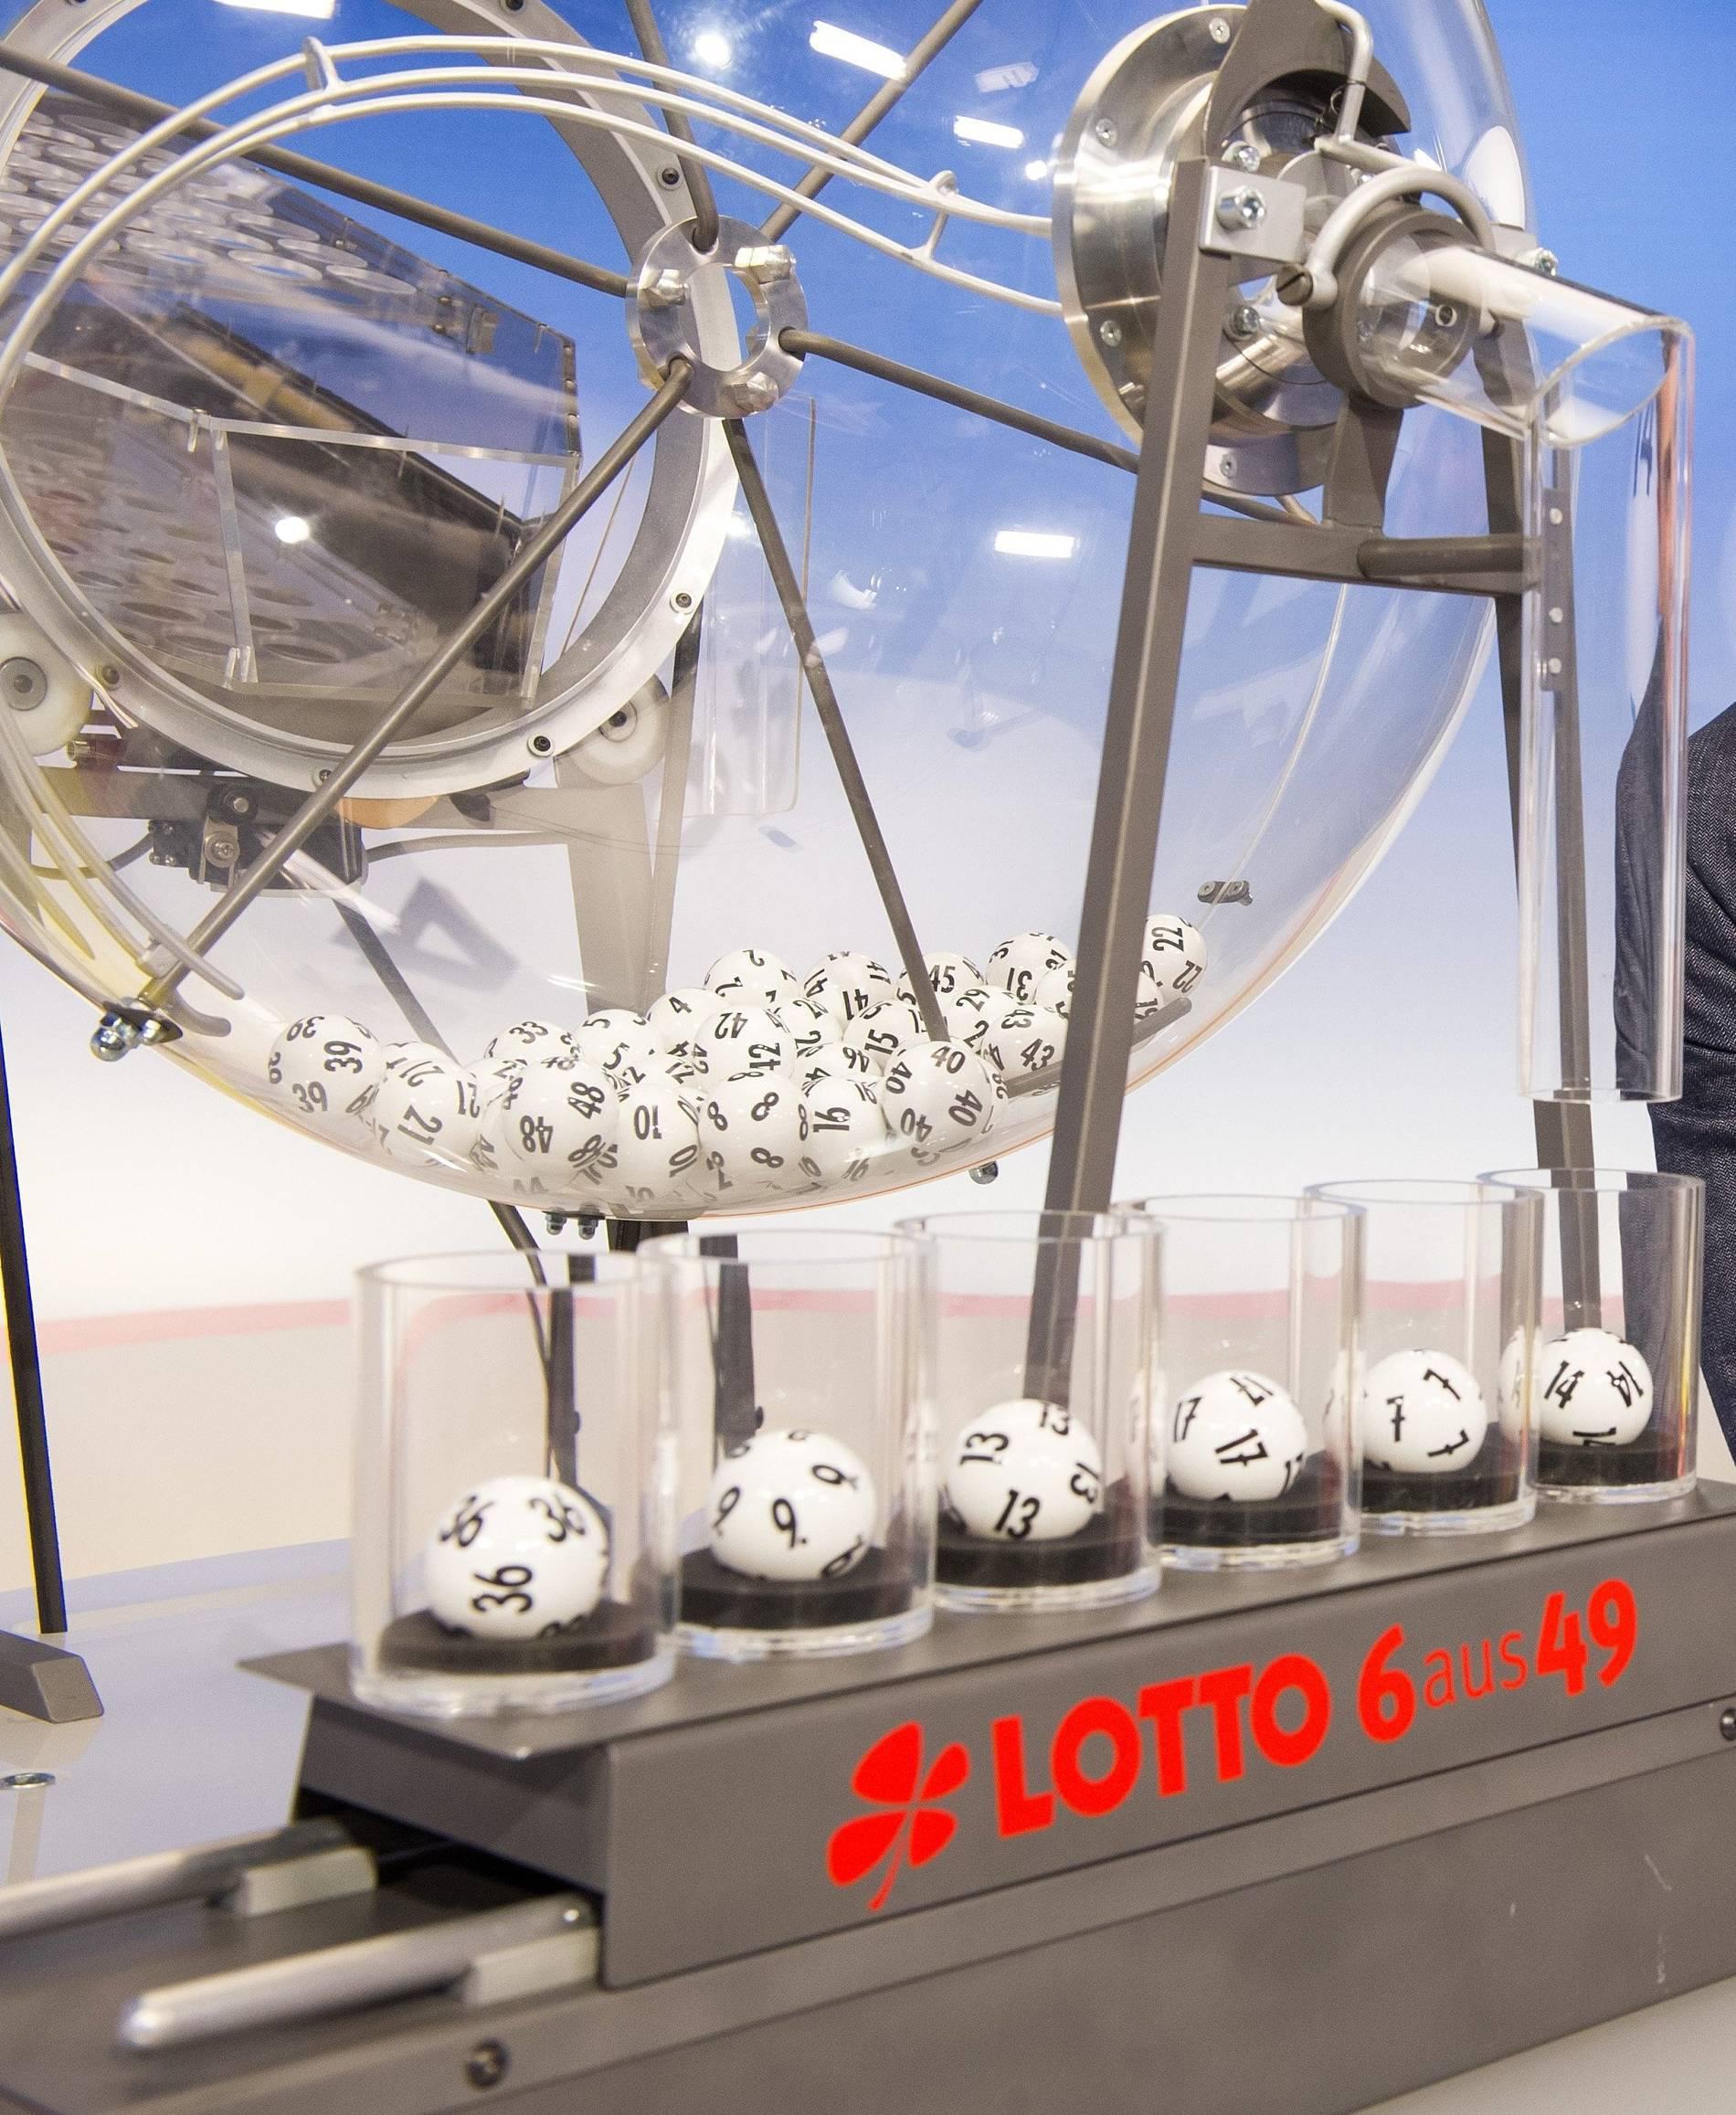 Saar Lotto